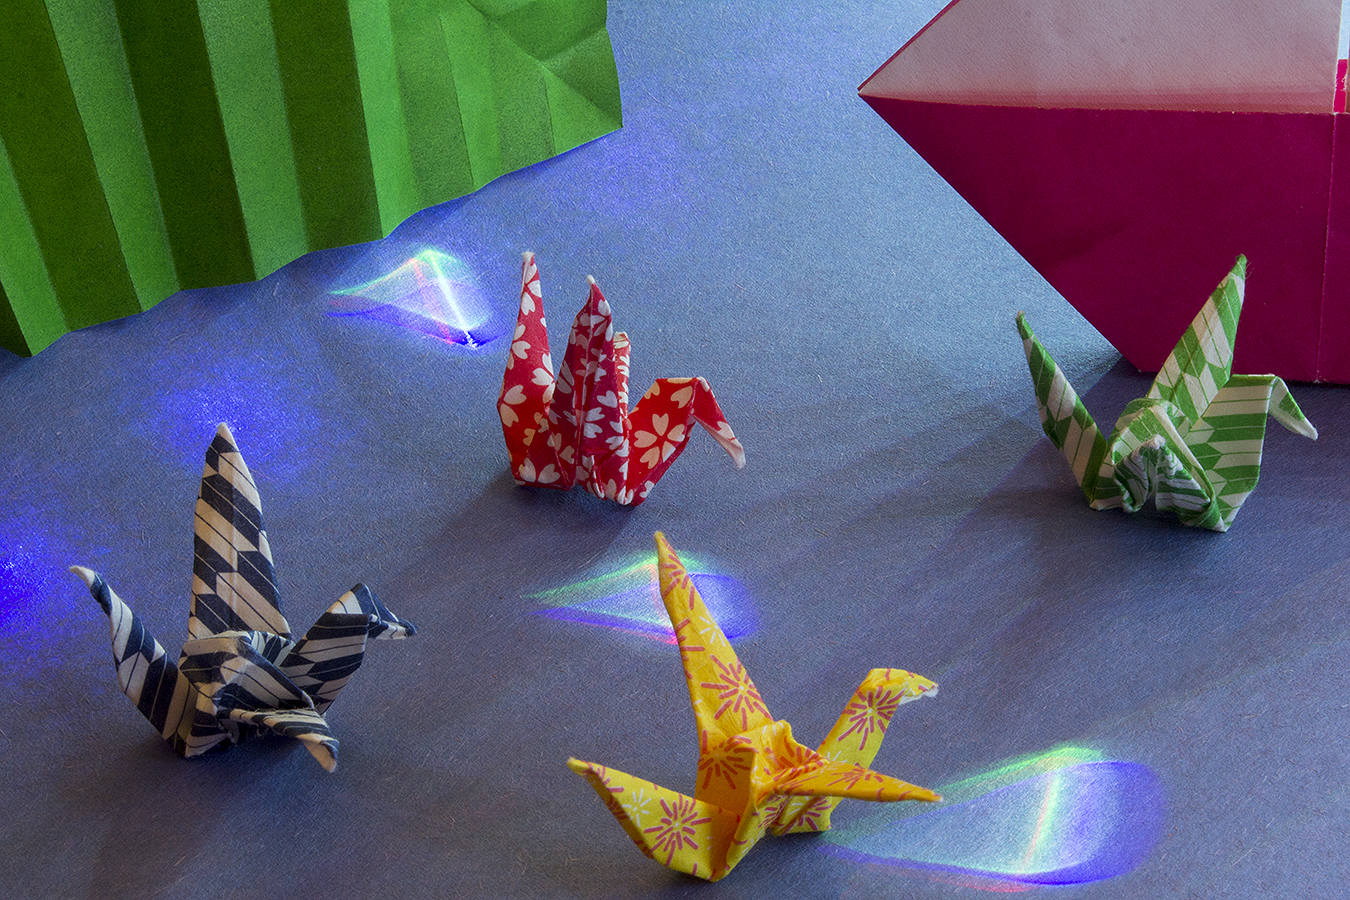 23_Gems_Jonathan_Tang_UPenn_Tony_Ward_Studio_Long_Exposure_Low_Light_LED_Optics_Origami_Paper_Sea_Leaf_Boat_Cranes